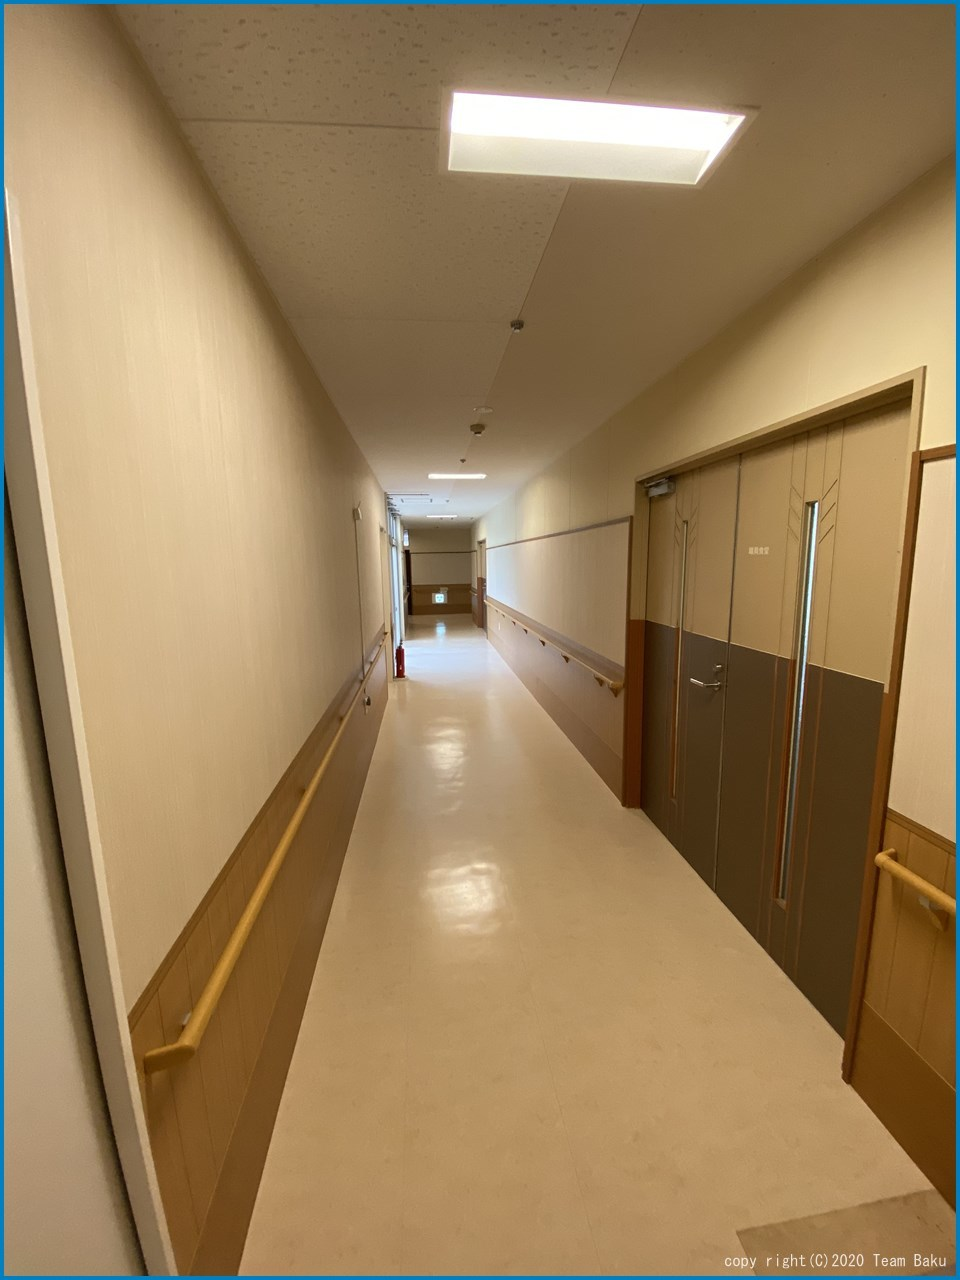 N病院グループ Nナーシング南館 改修・増築工事 6_c0376508_17105595.jpg